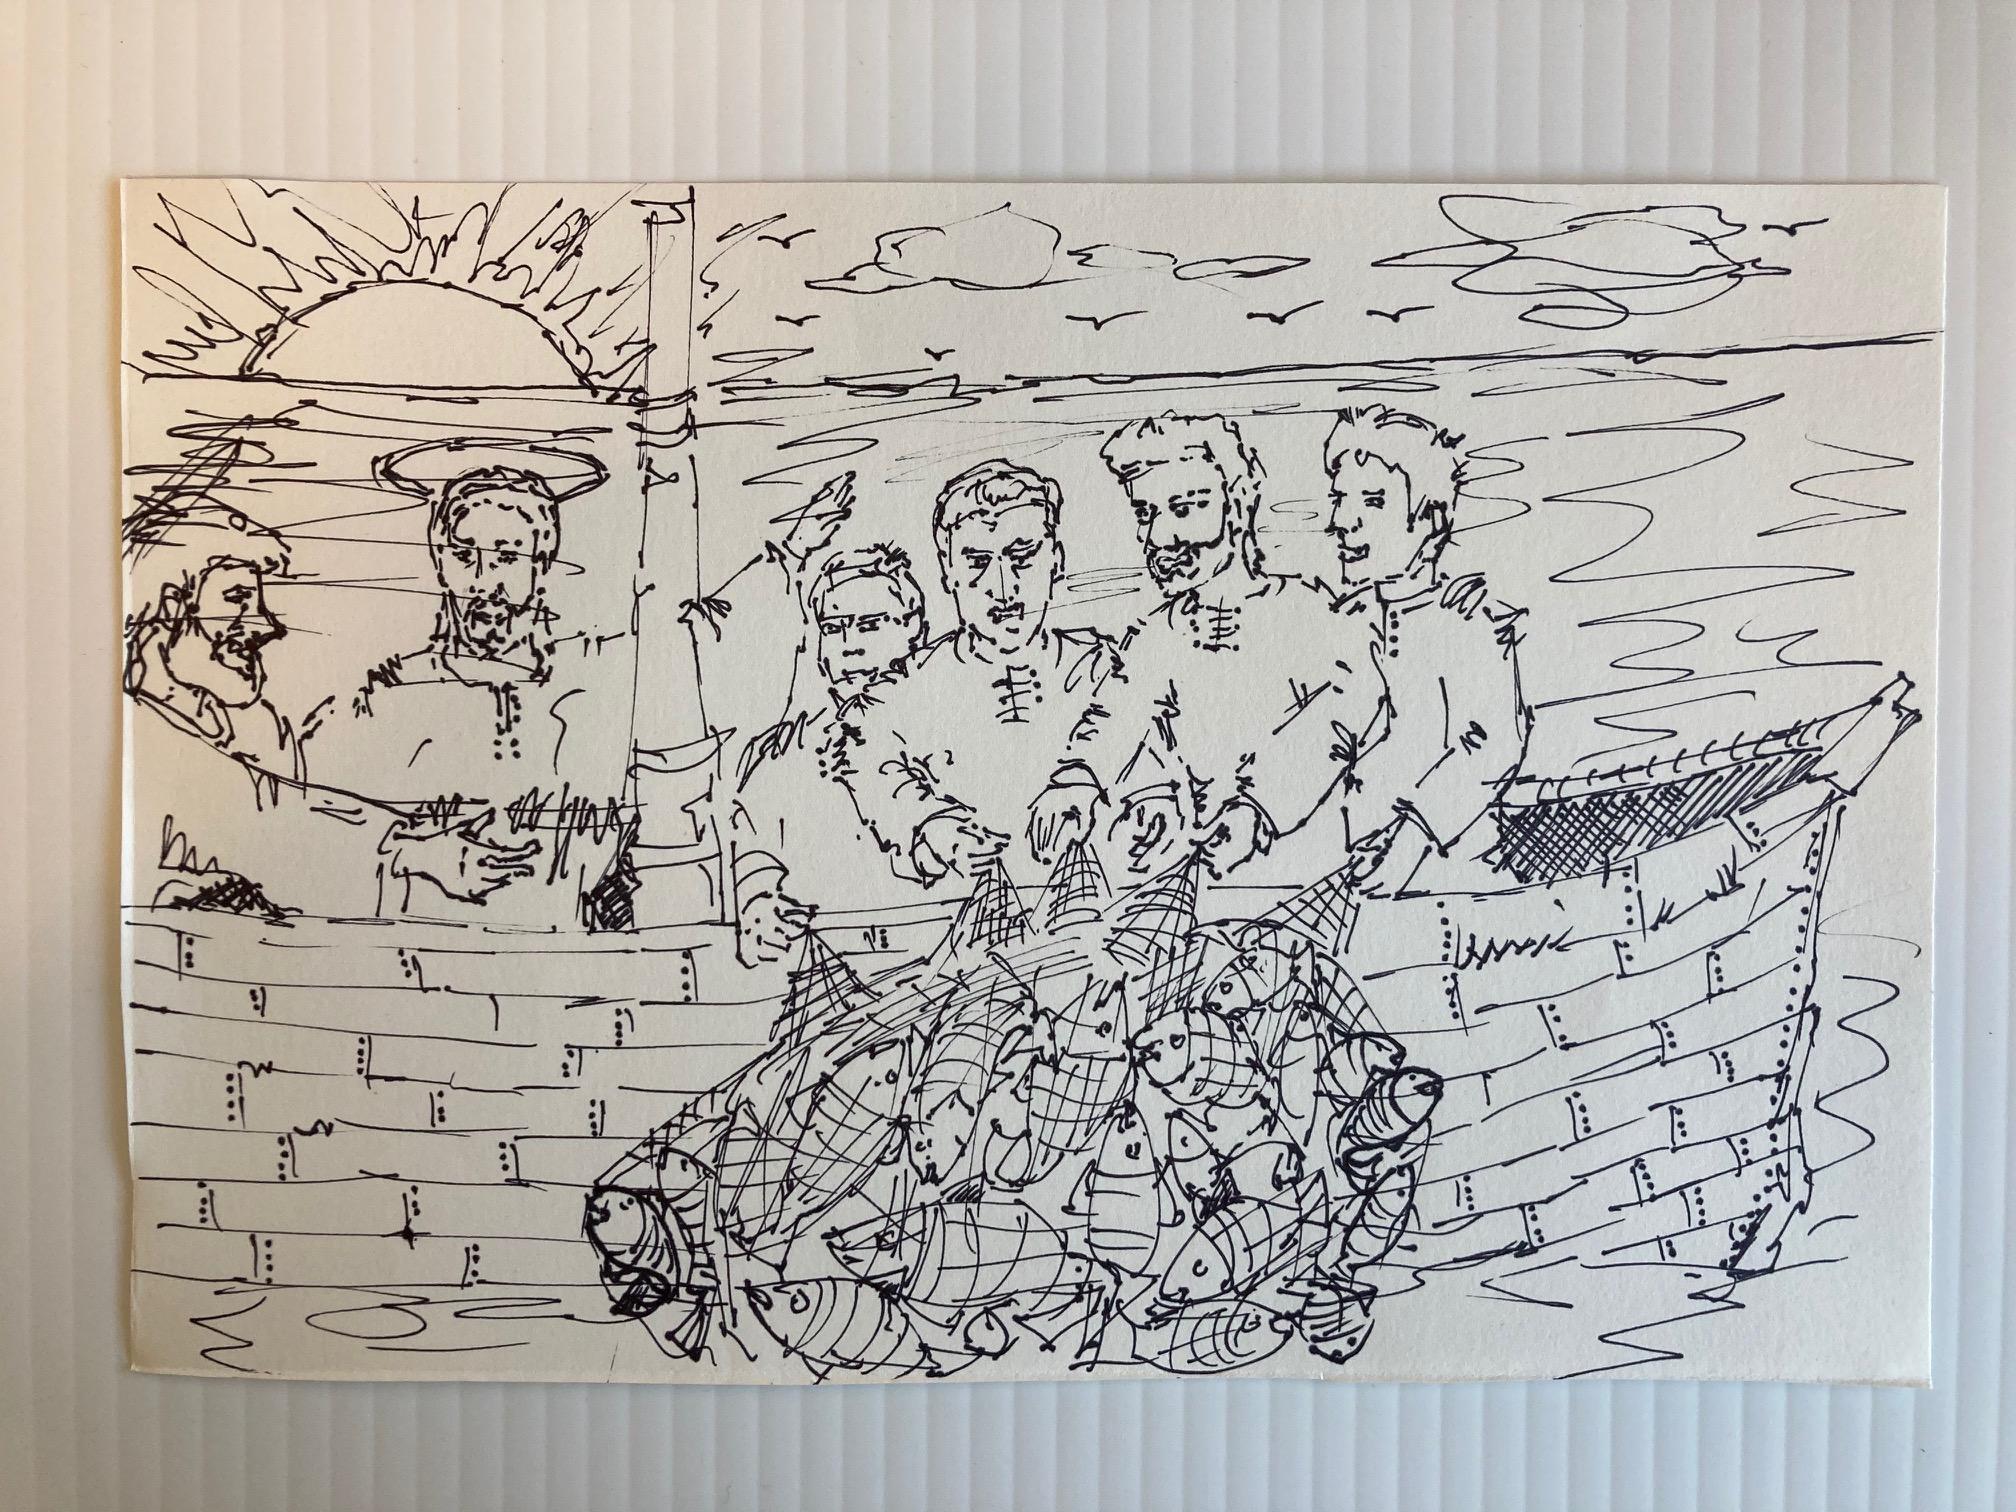 Surprise Sketches teach Art, Religion, Gratitude